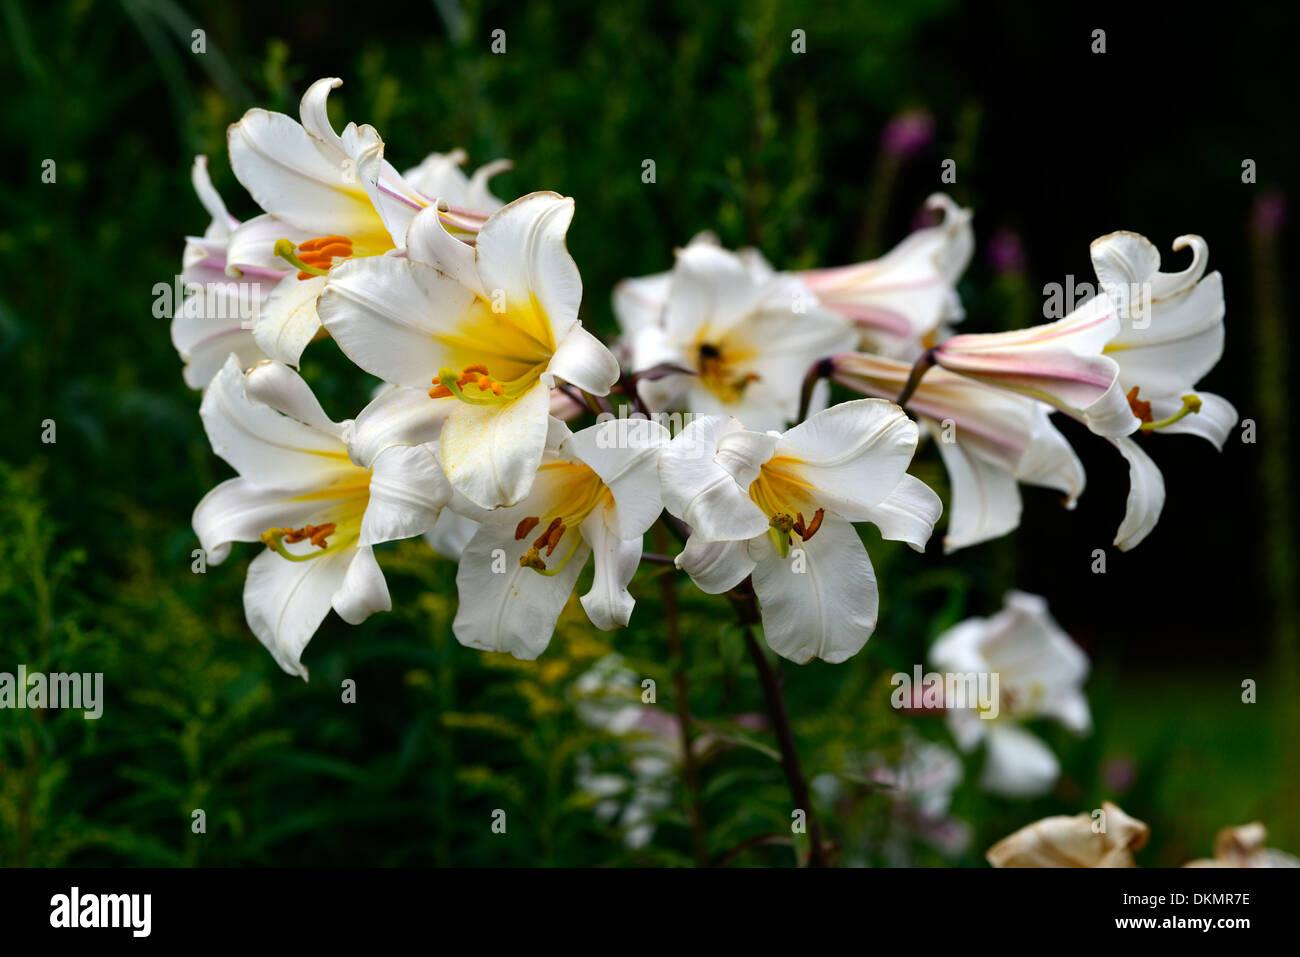 Lilium regale regal lily lilies white flowers flowering blooms stock lilium regale regal lily lilies white flowers flowering blooms scented scents fragrant fragrance summer perennial bulb izmirmasajfo